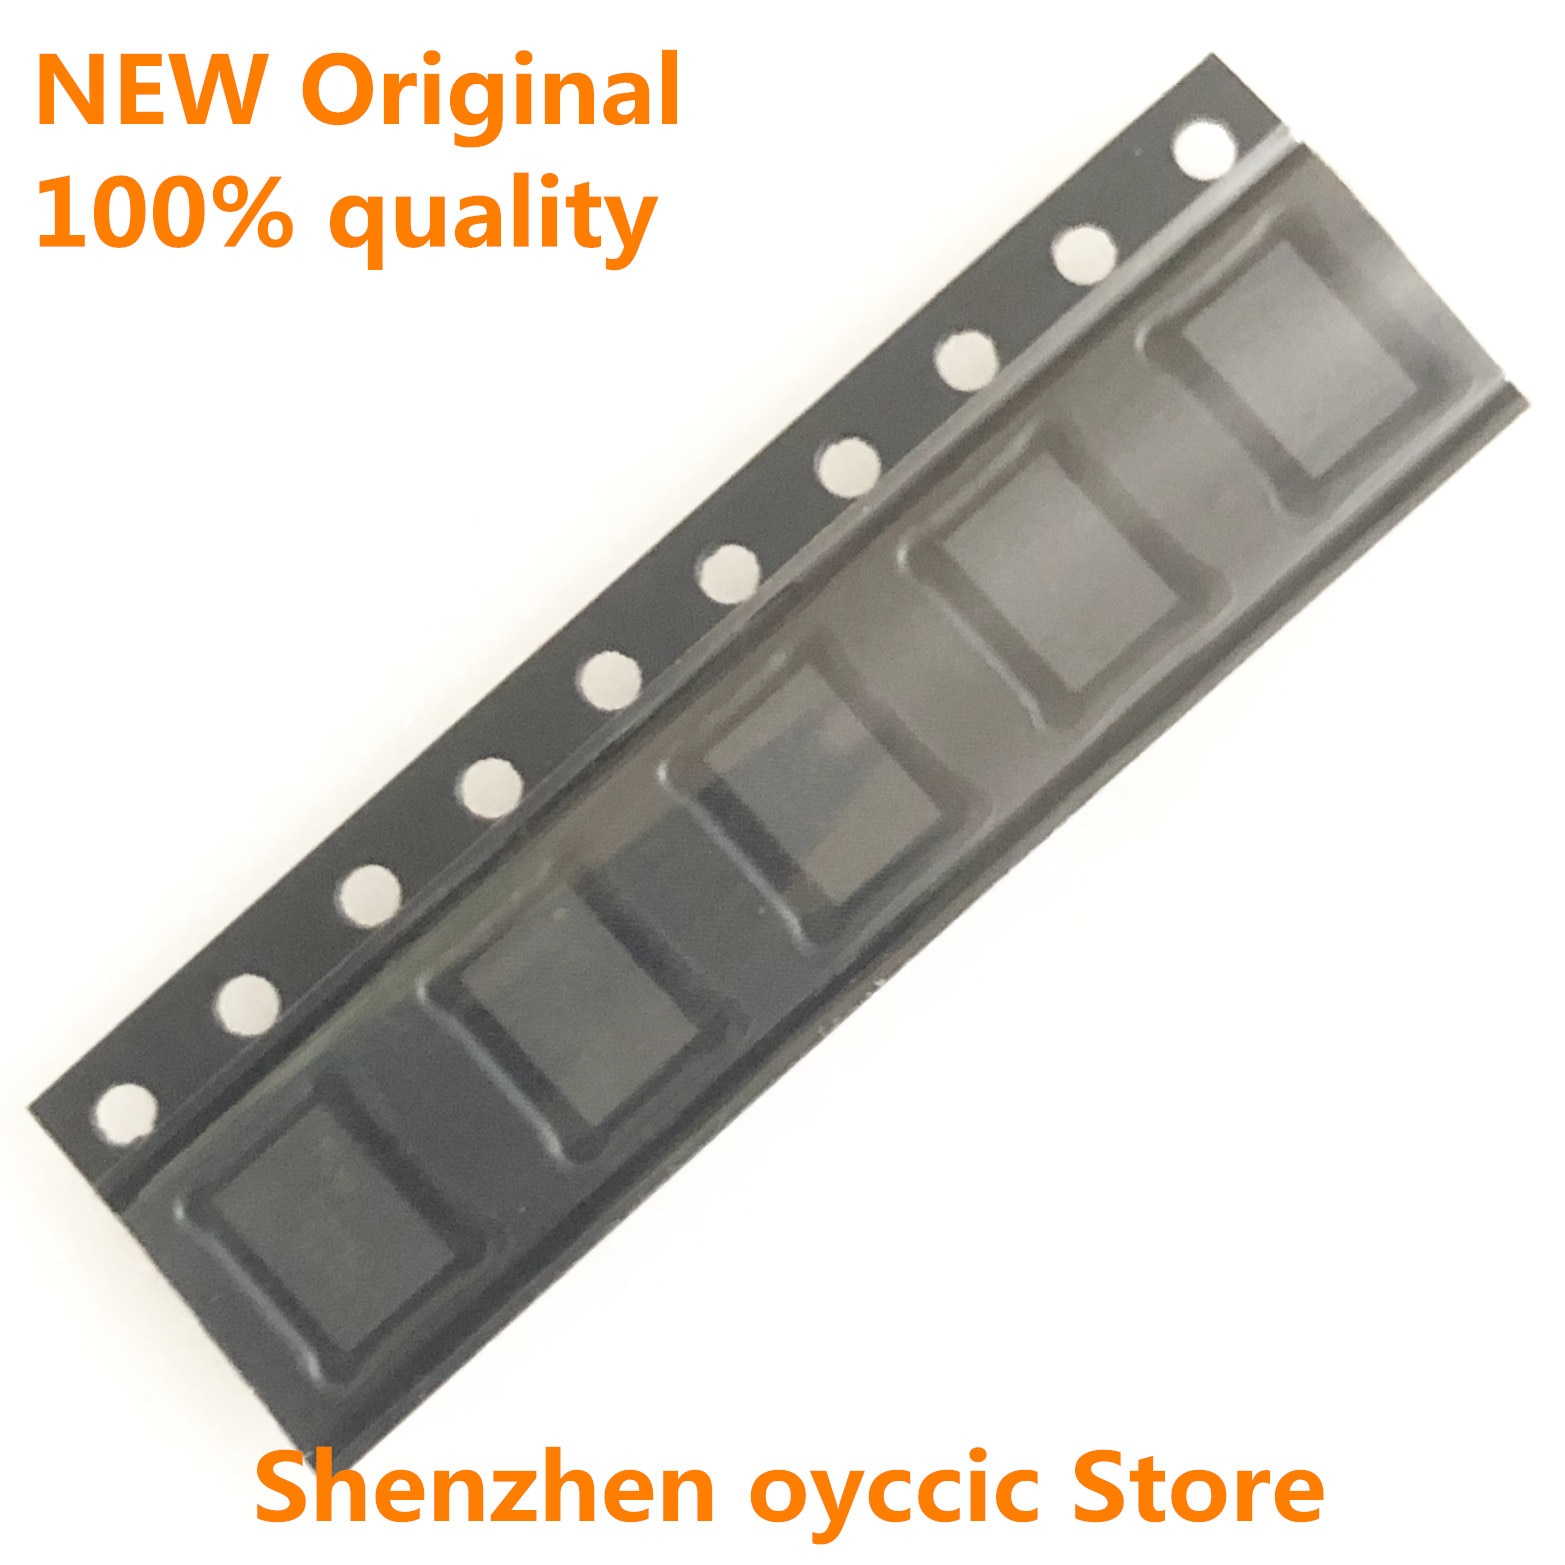 10 piezas TPS22966DPUR TPS22966 (RB966 RB2966 R8966) QFN-14 IC Chipset